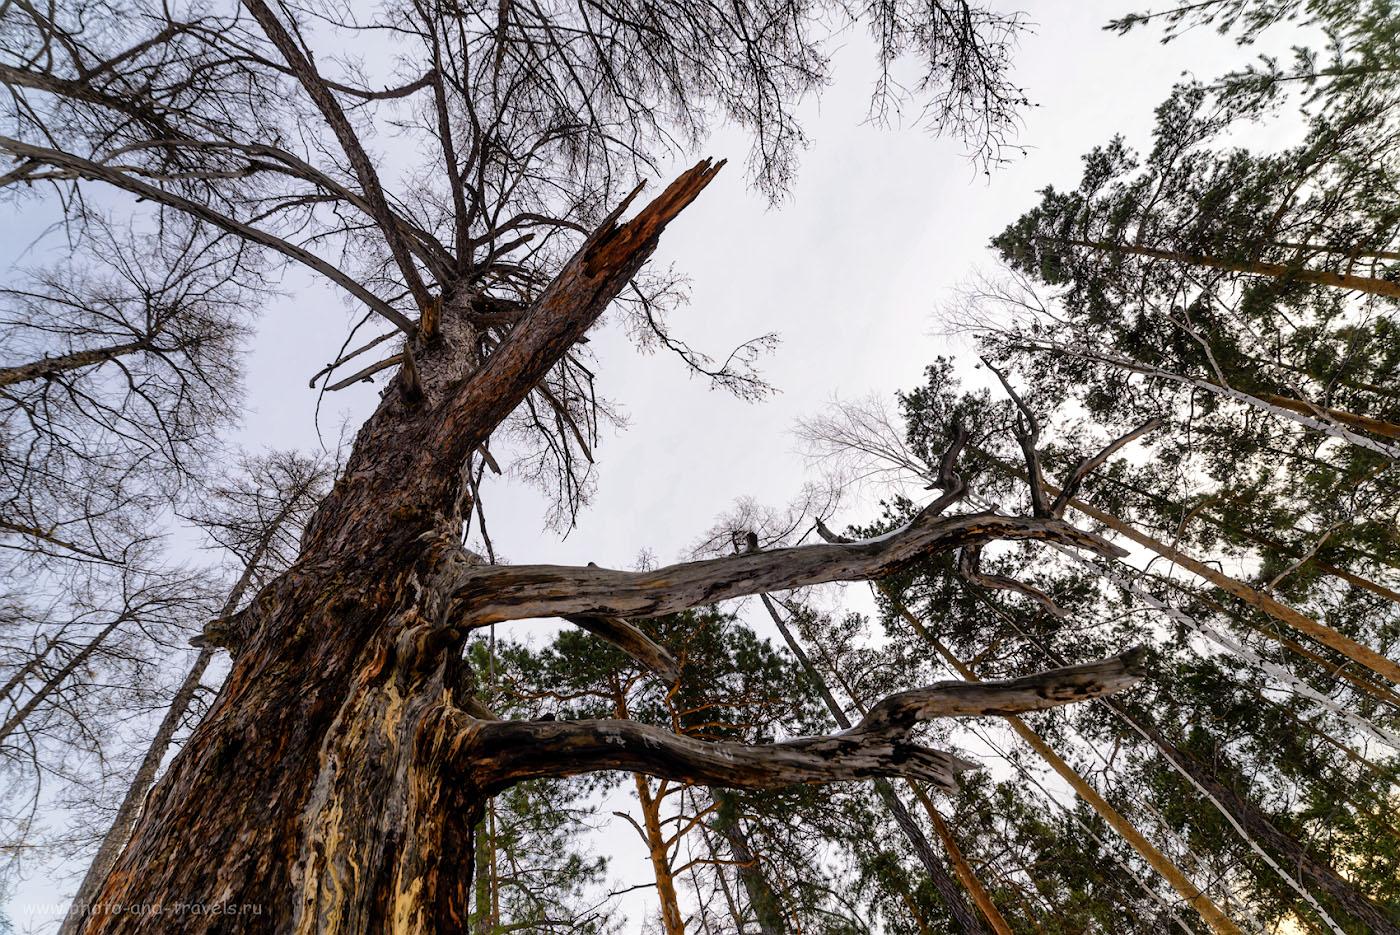 Фотография 17. Старое-престарое дерево на Сугомаке. 1/200, 9.0, 220, 14.